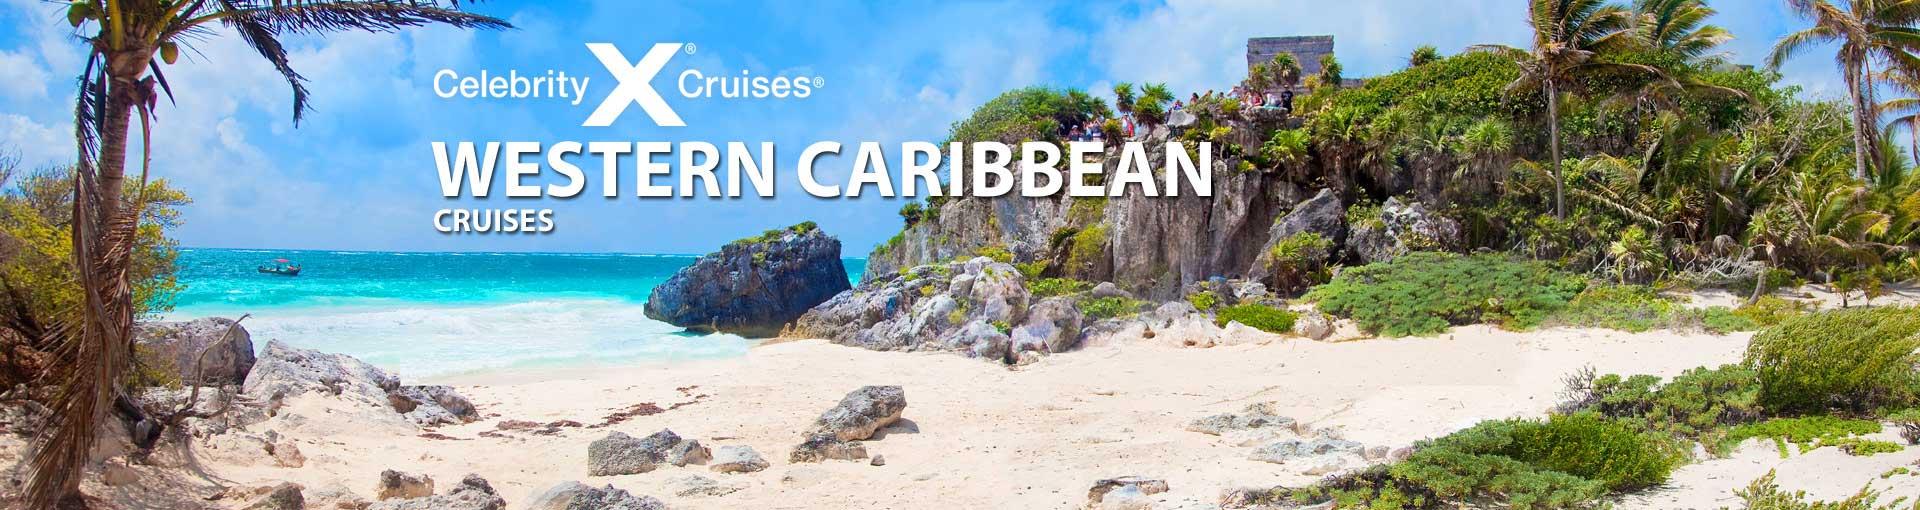 Celebrity Western Caribbean Cruises And Western